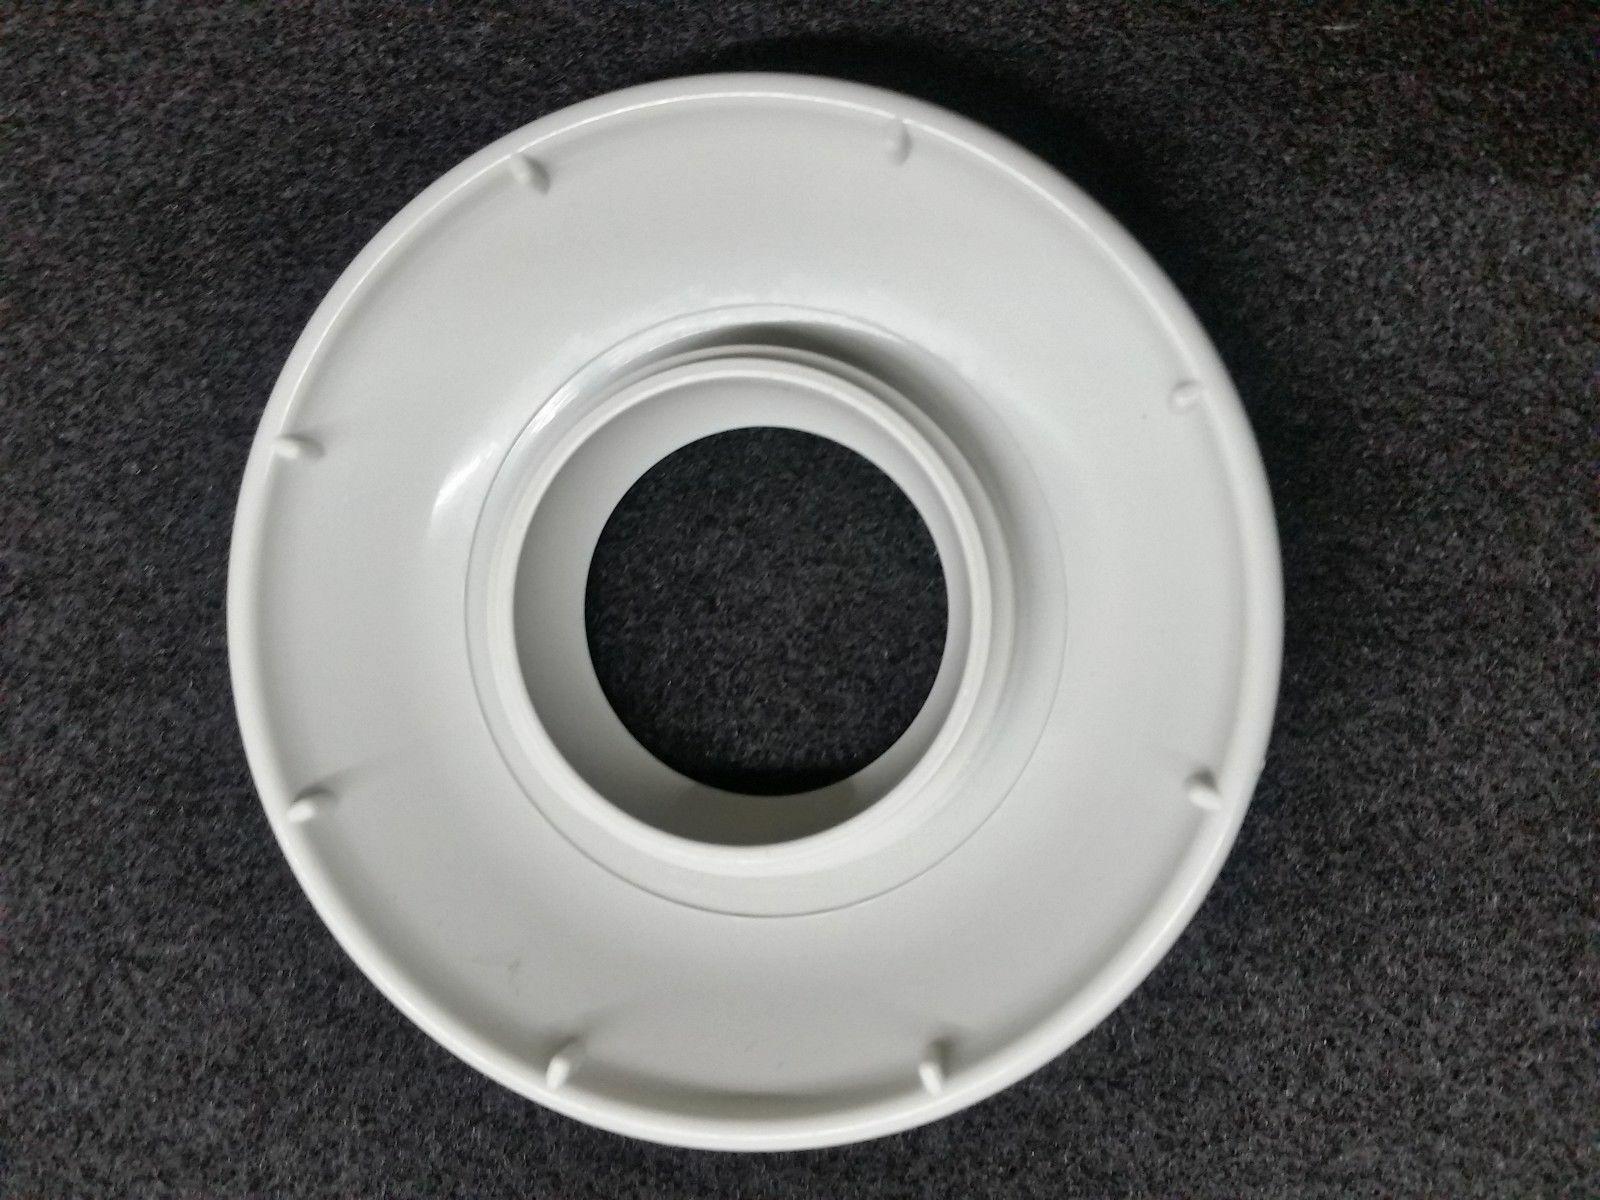 Doughboy, Lomart Return sections 340-1593 Cvr, 340-1592 Mid, 3401591 Body /Gray